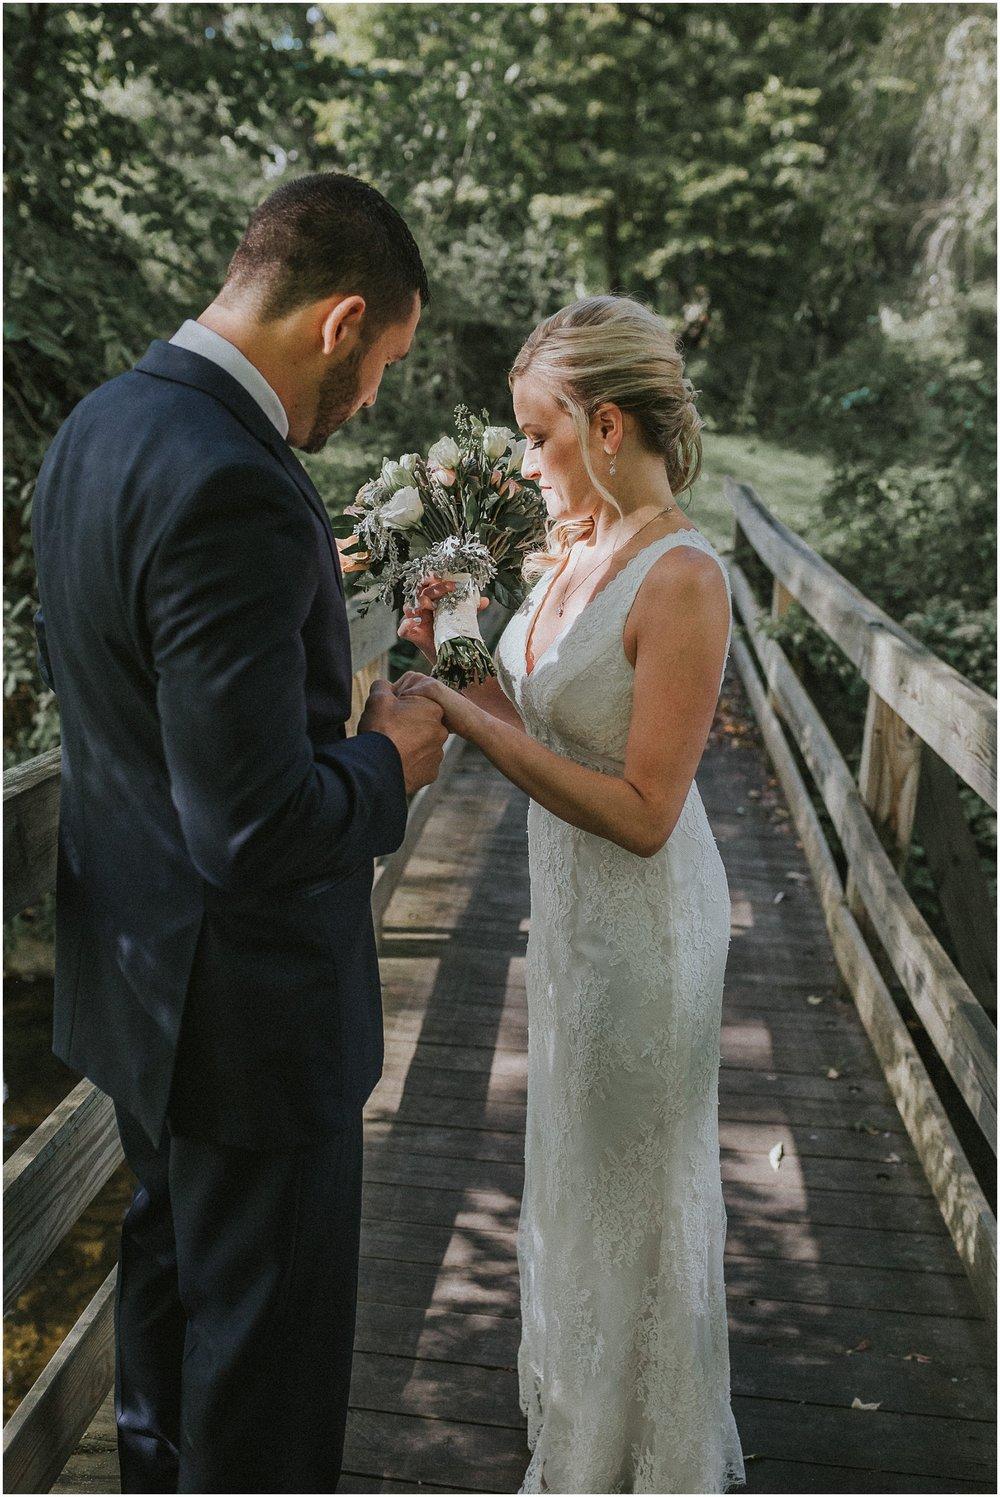 waterloo-village-waterloo village-wedding-outdoor wedding-rustic-boemian-new jersey-bride-groom-wedding party-davids bridal-wedding dress-wedding-first kiss-intimate wedding_0358.jpg